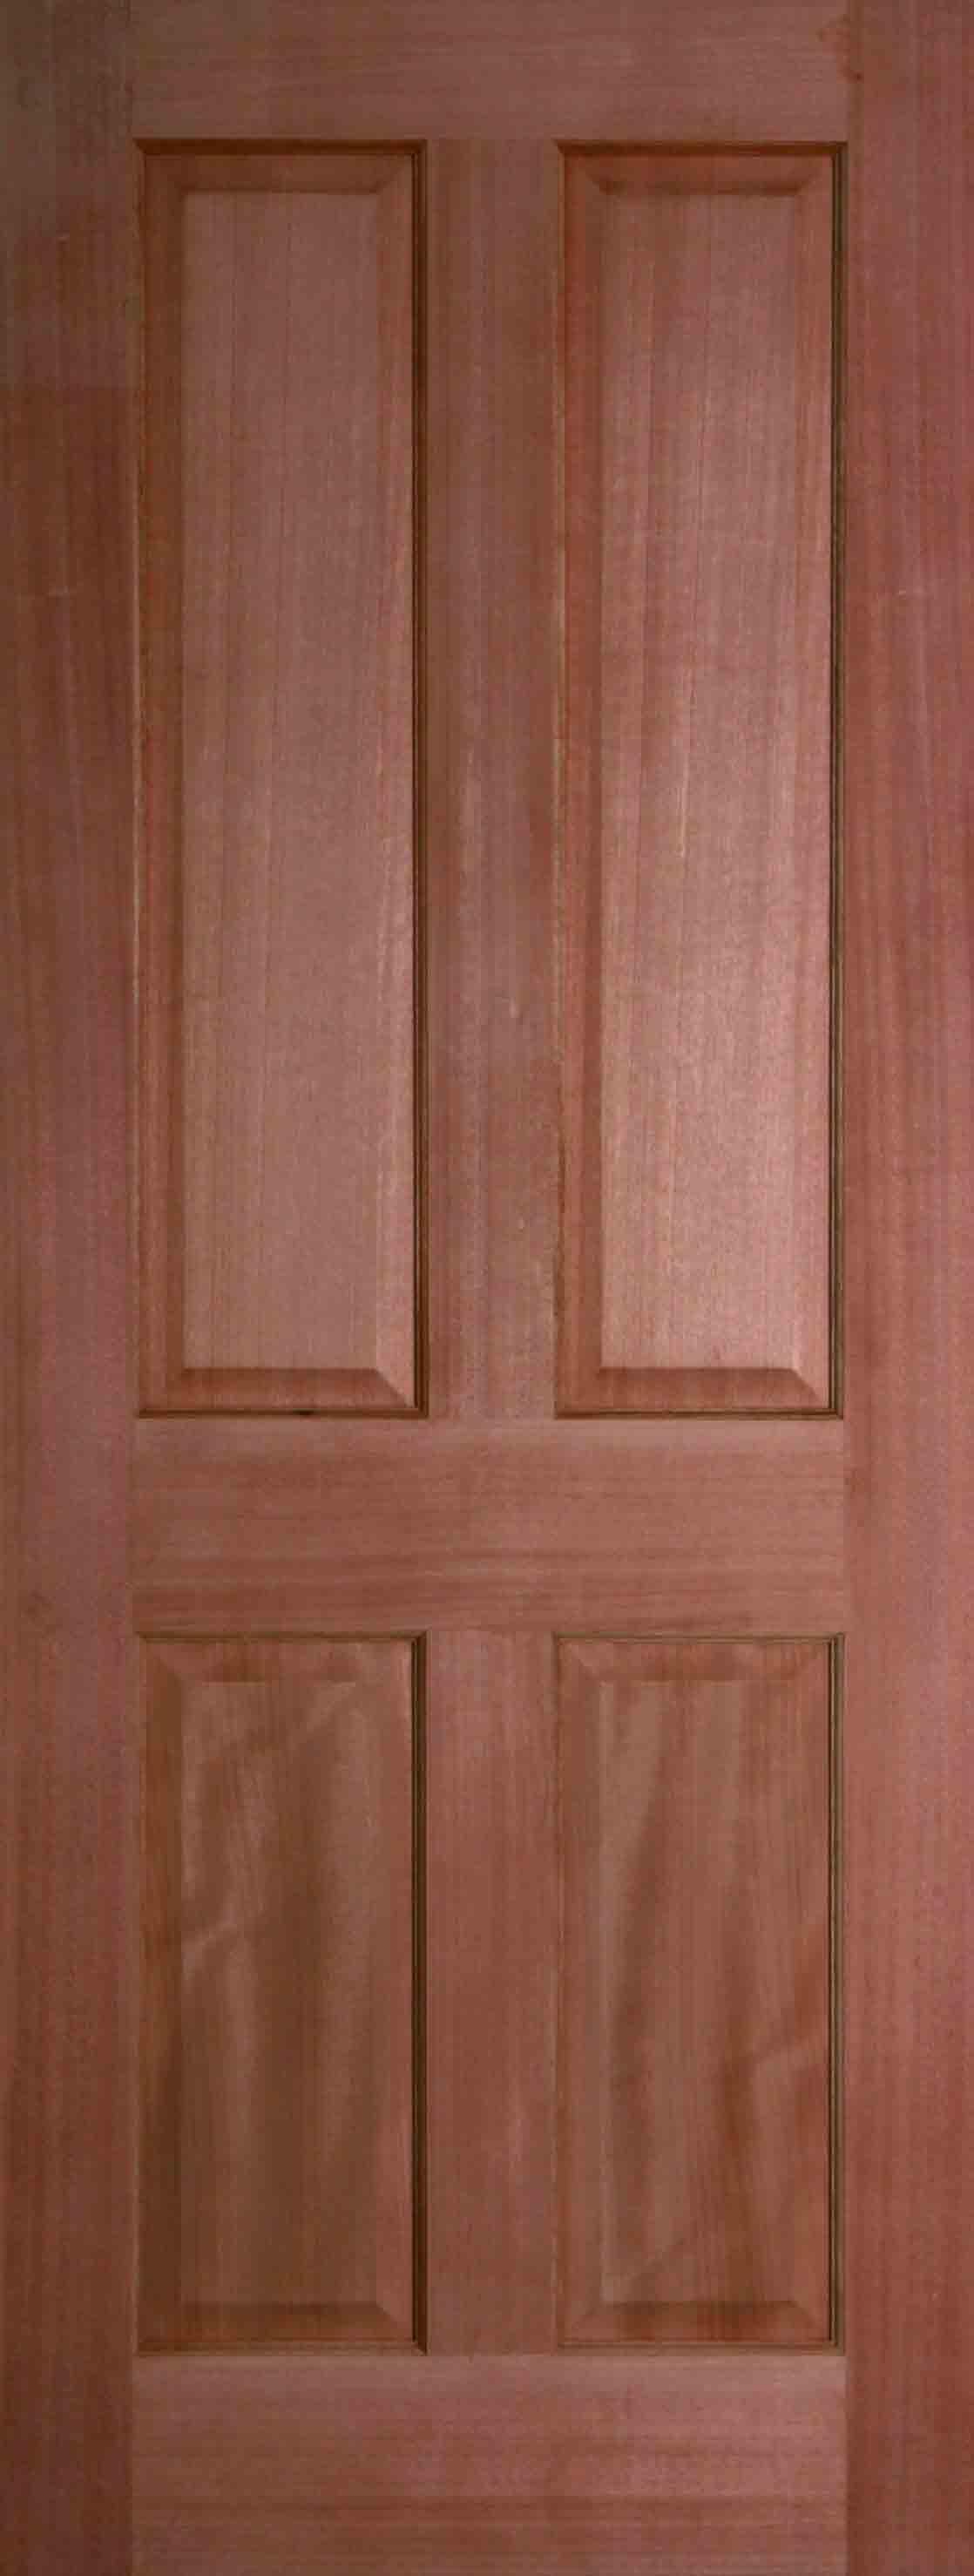 Internal Hardwood Colonial 6 Panel Door Unfinished Finewood